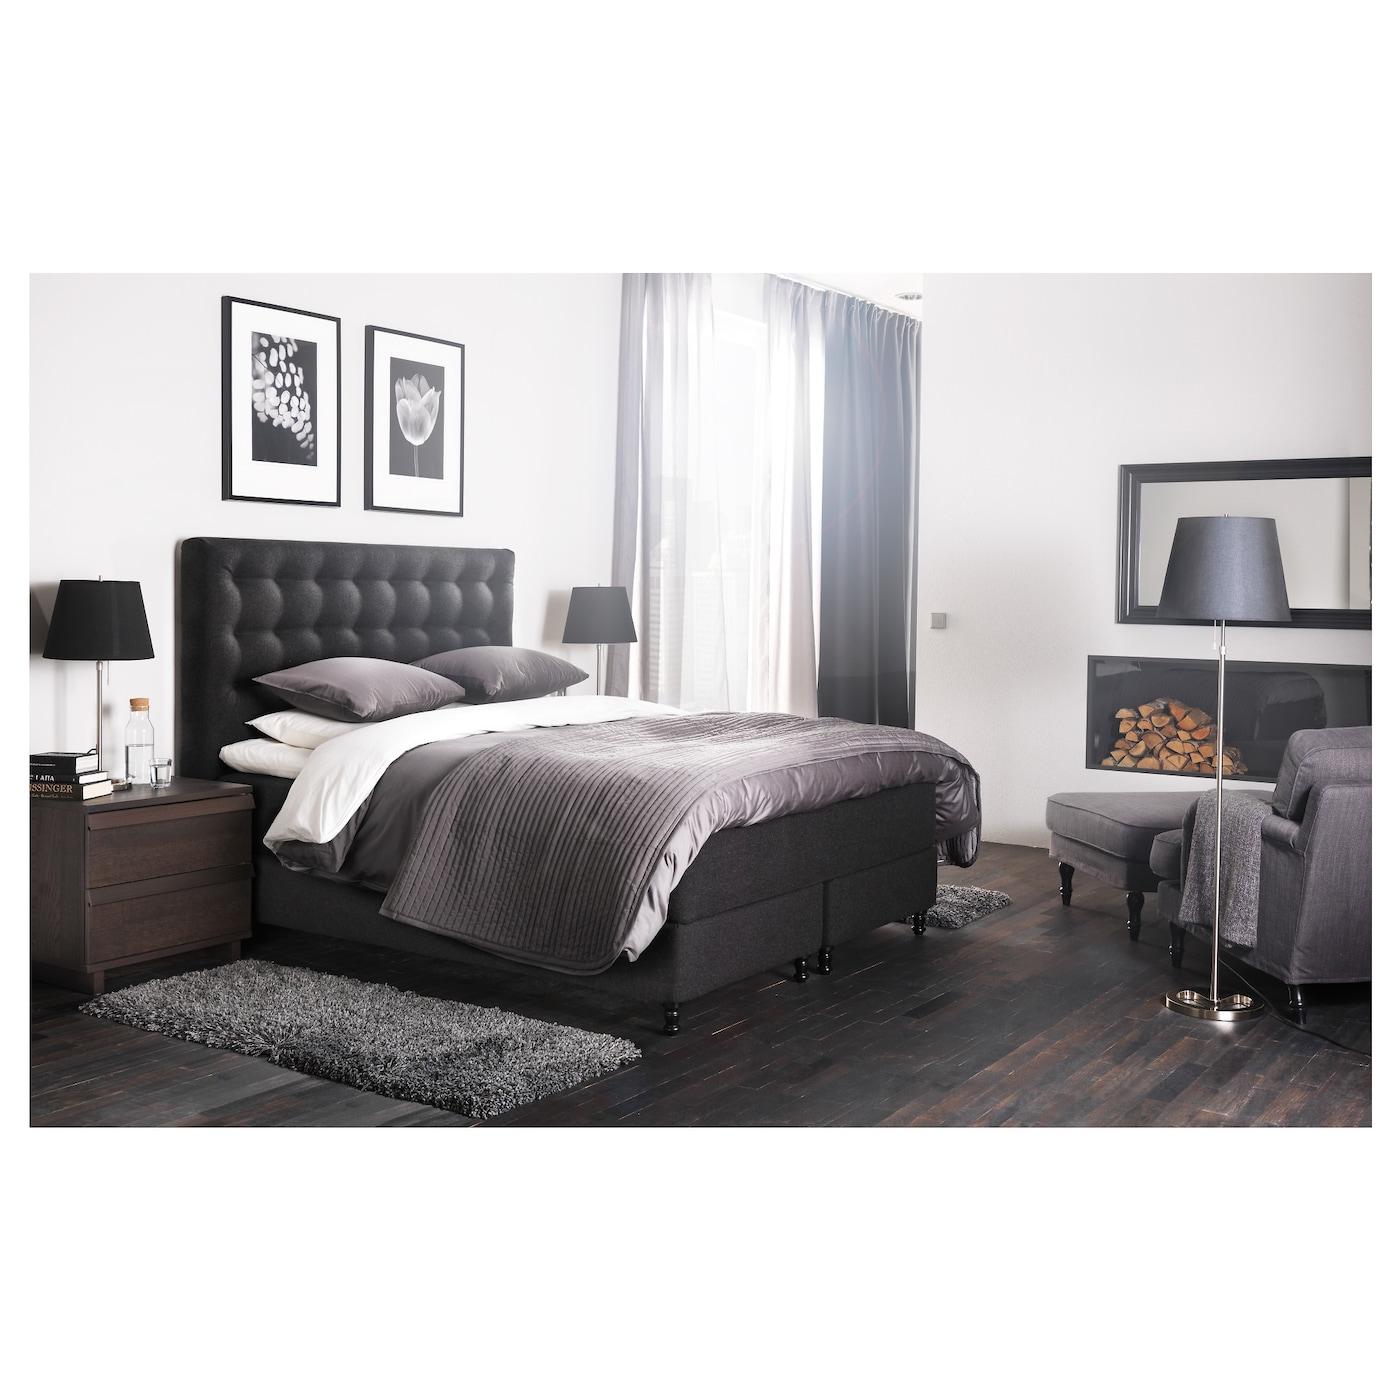 vallavik boxspring hyllestad stevig tuss y grijs 180x200. Black Bedroom Furniture Sets. Home Design Ideas